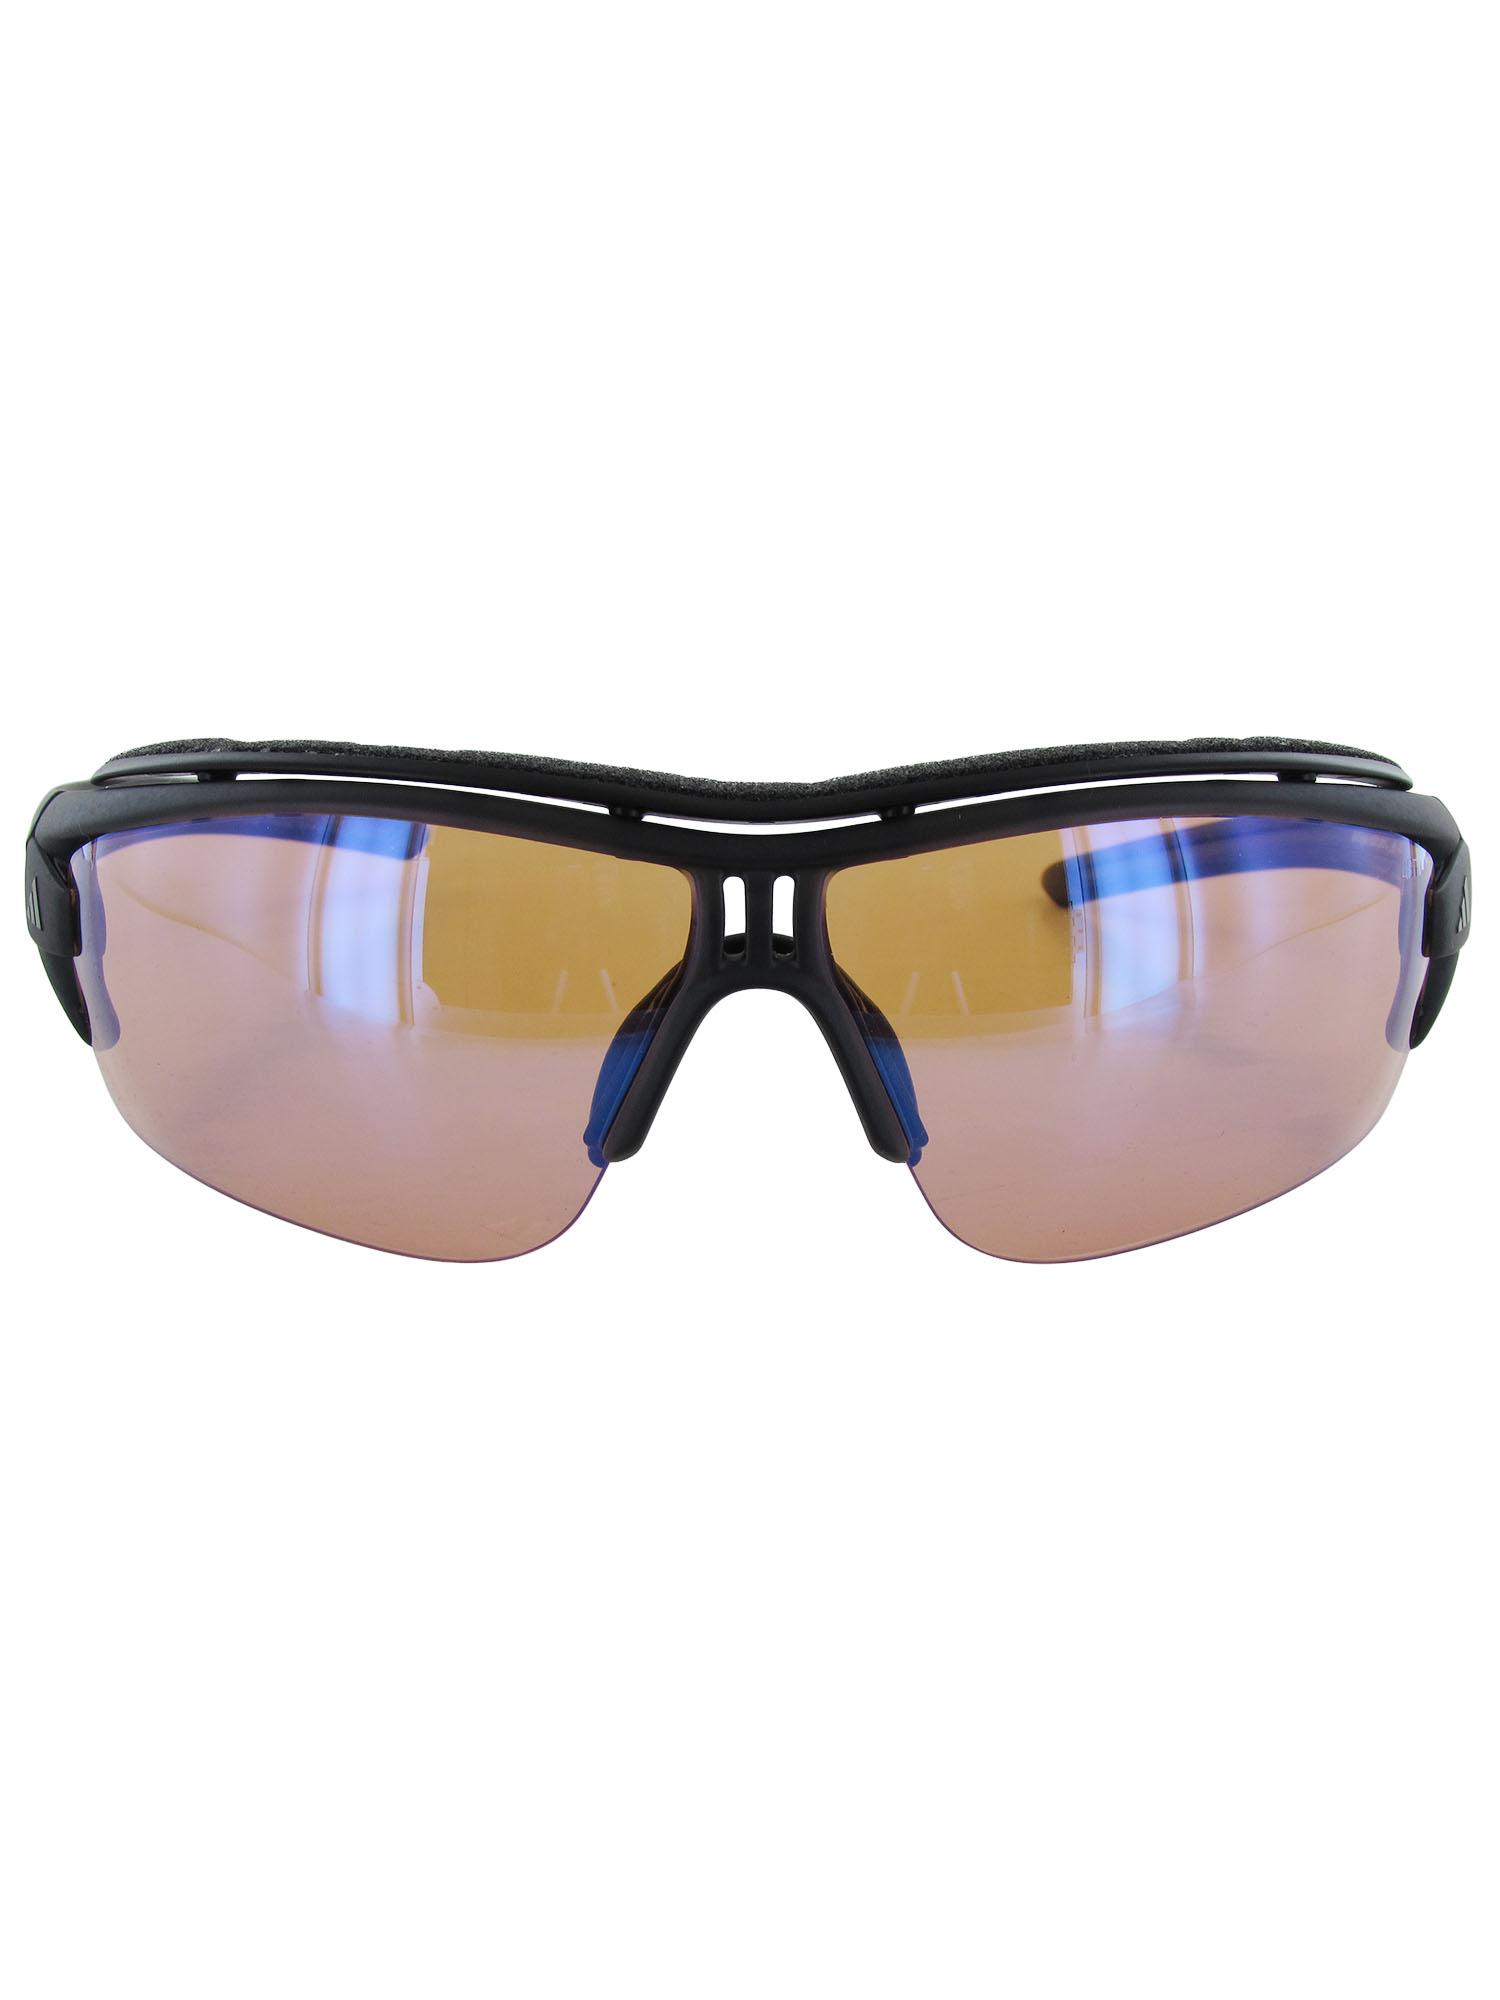 Adidas-Evil-Eye-Halfrim-Pro-XS-Sunglasses thumbnail 4